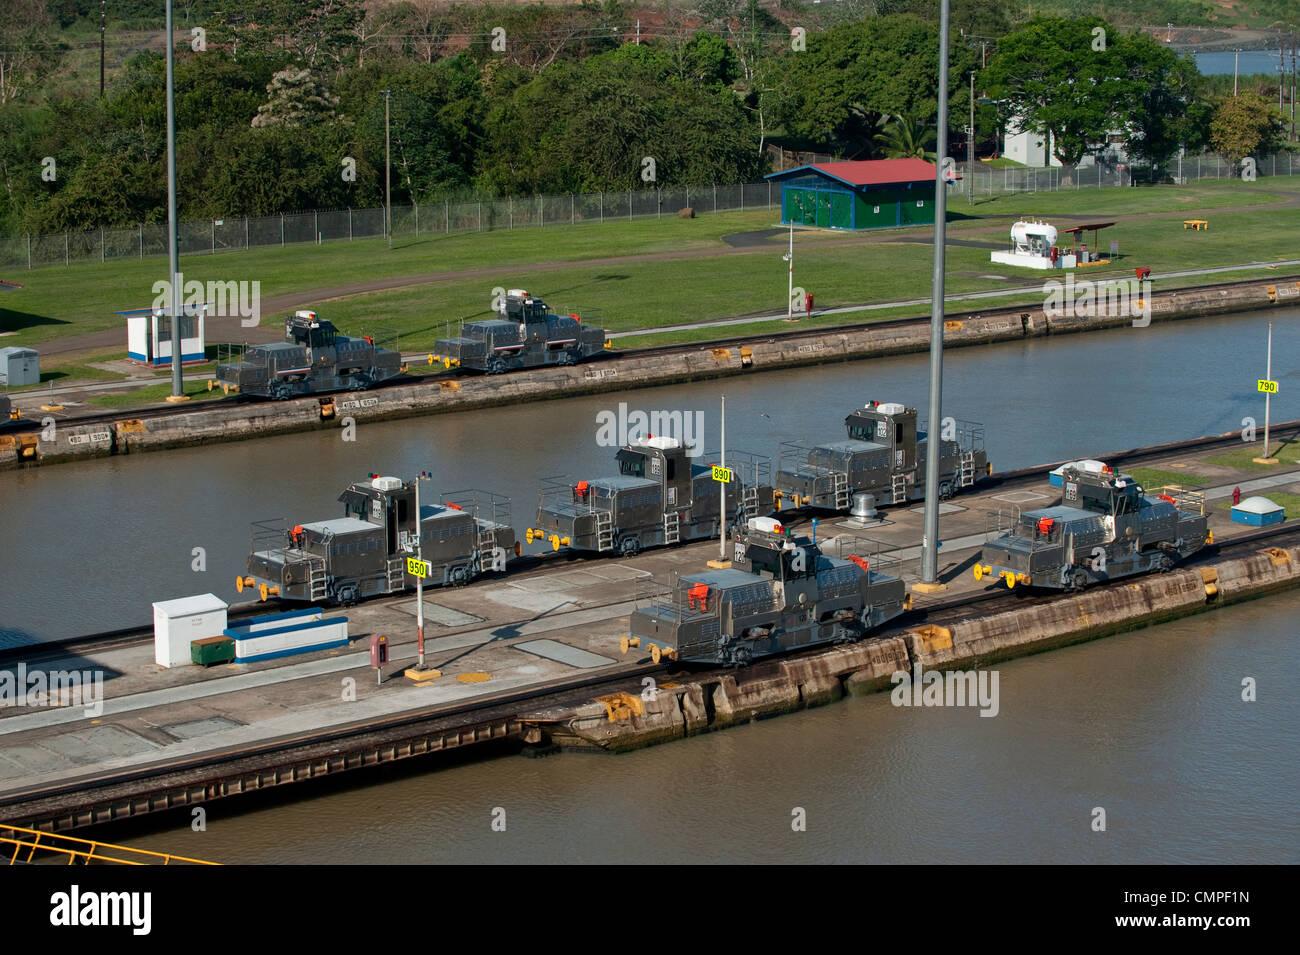 Group of locomotives at Miraflores Locks. Panama Canal - Stock Image